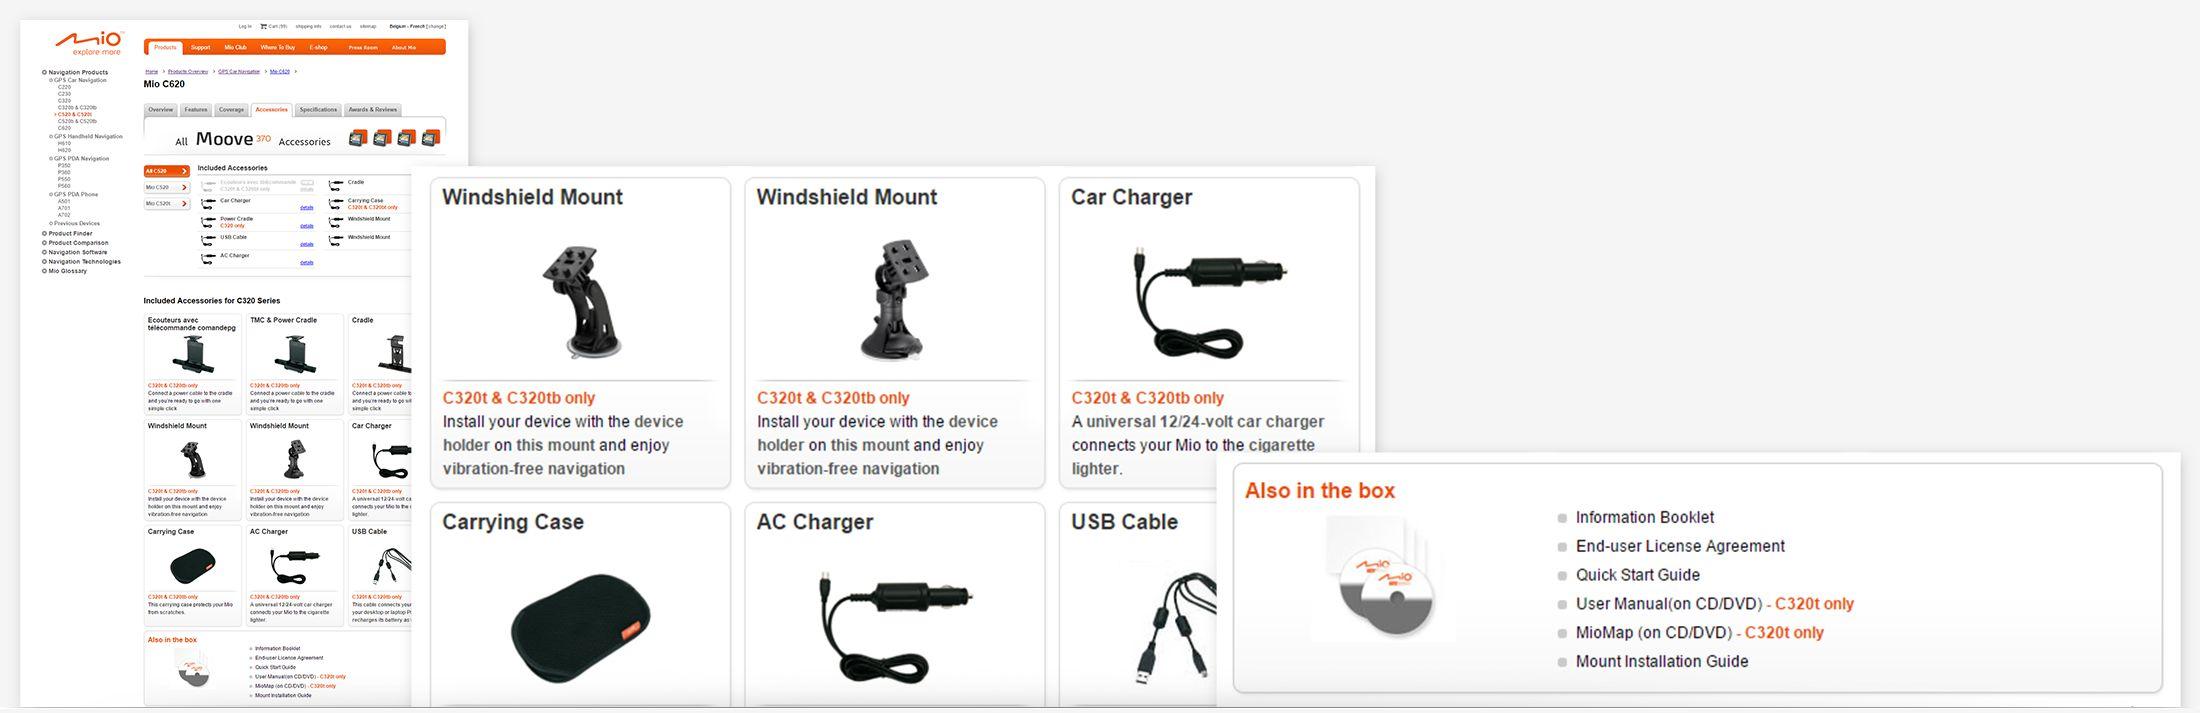 Mio Technology - device accessories